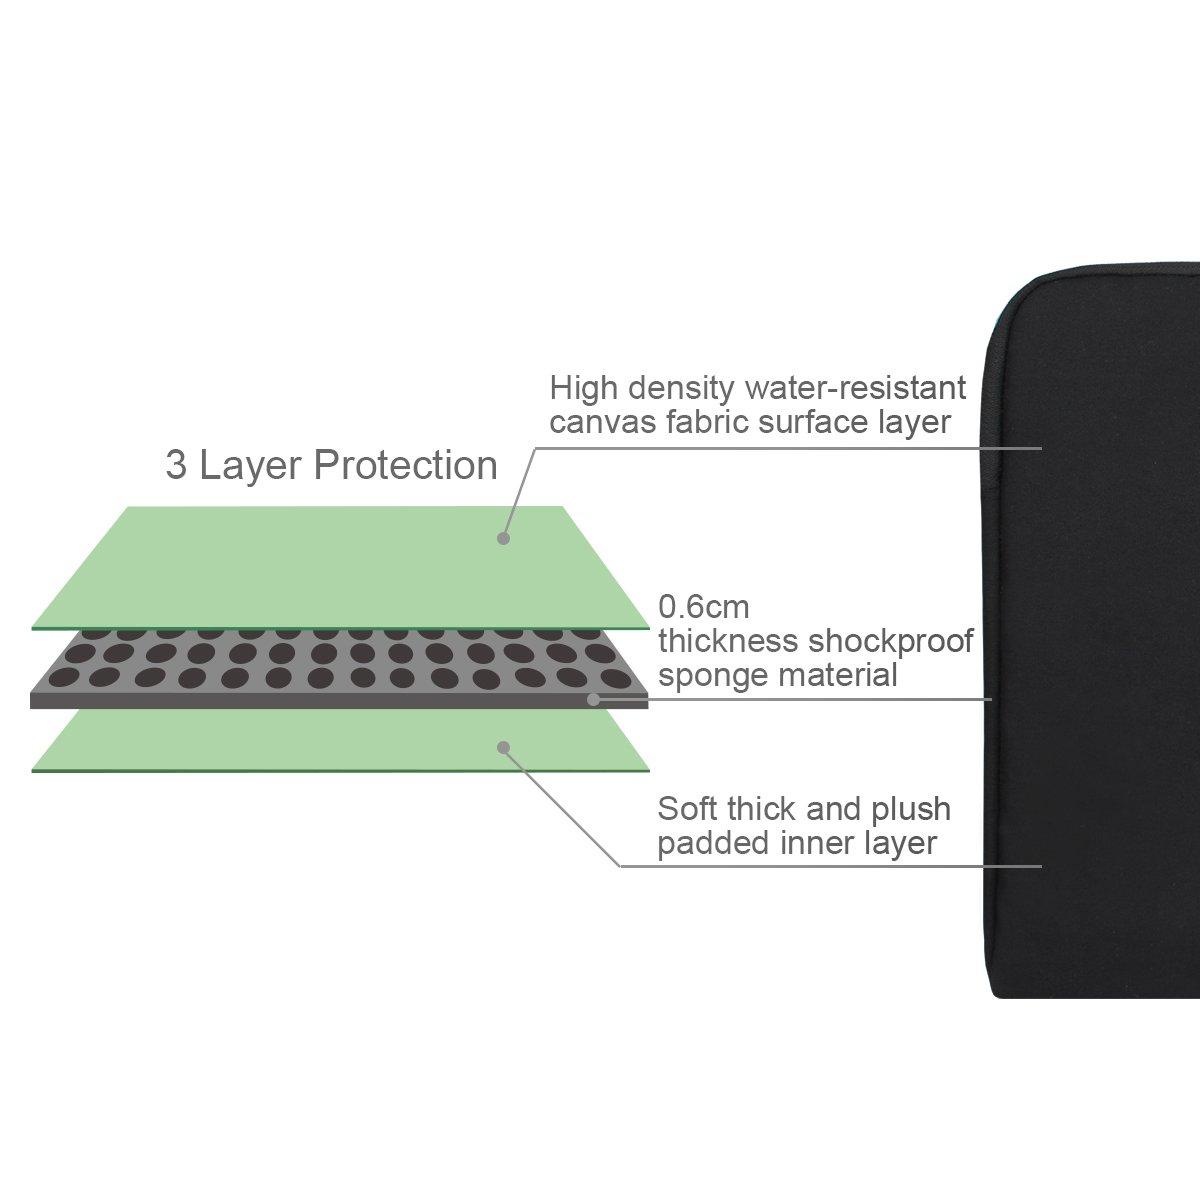 Arvok 15 15.6 Inch Multi-Color & Size Water-resistant Laptop Sleeve Bag with Handle/Notebook Computer Case/Ultrabook Briefcase Carrying Bag, Black by ARVOK (Image #5)